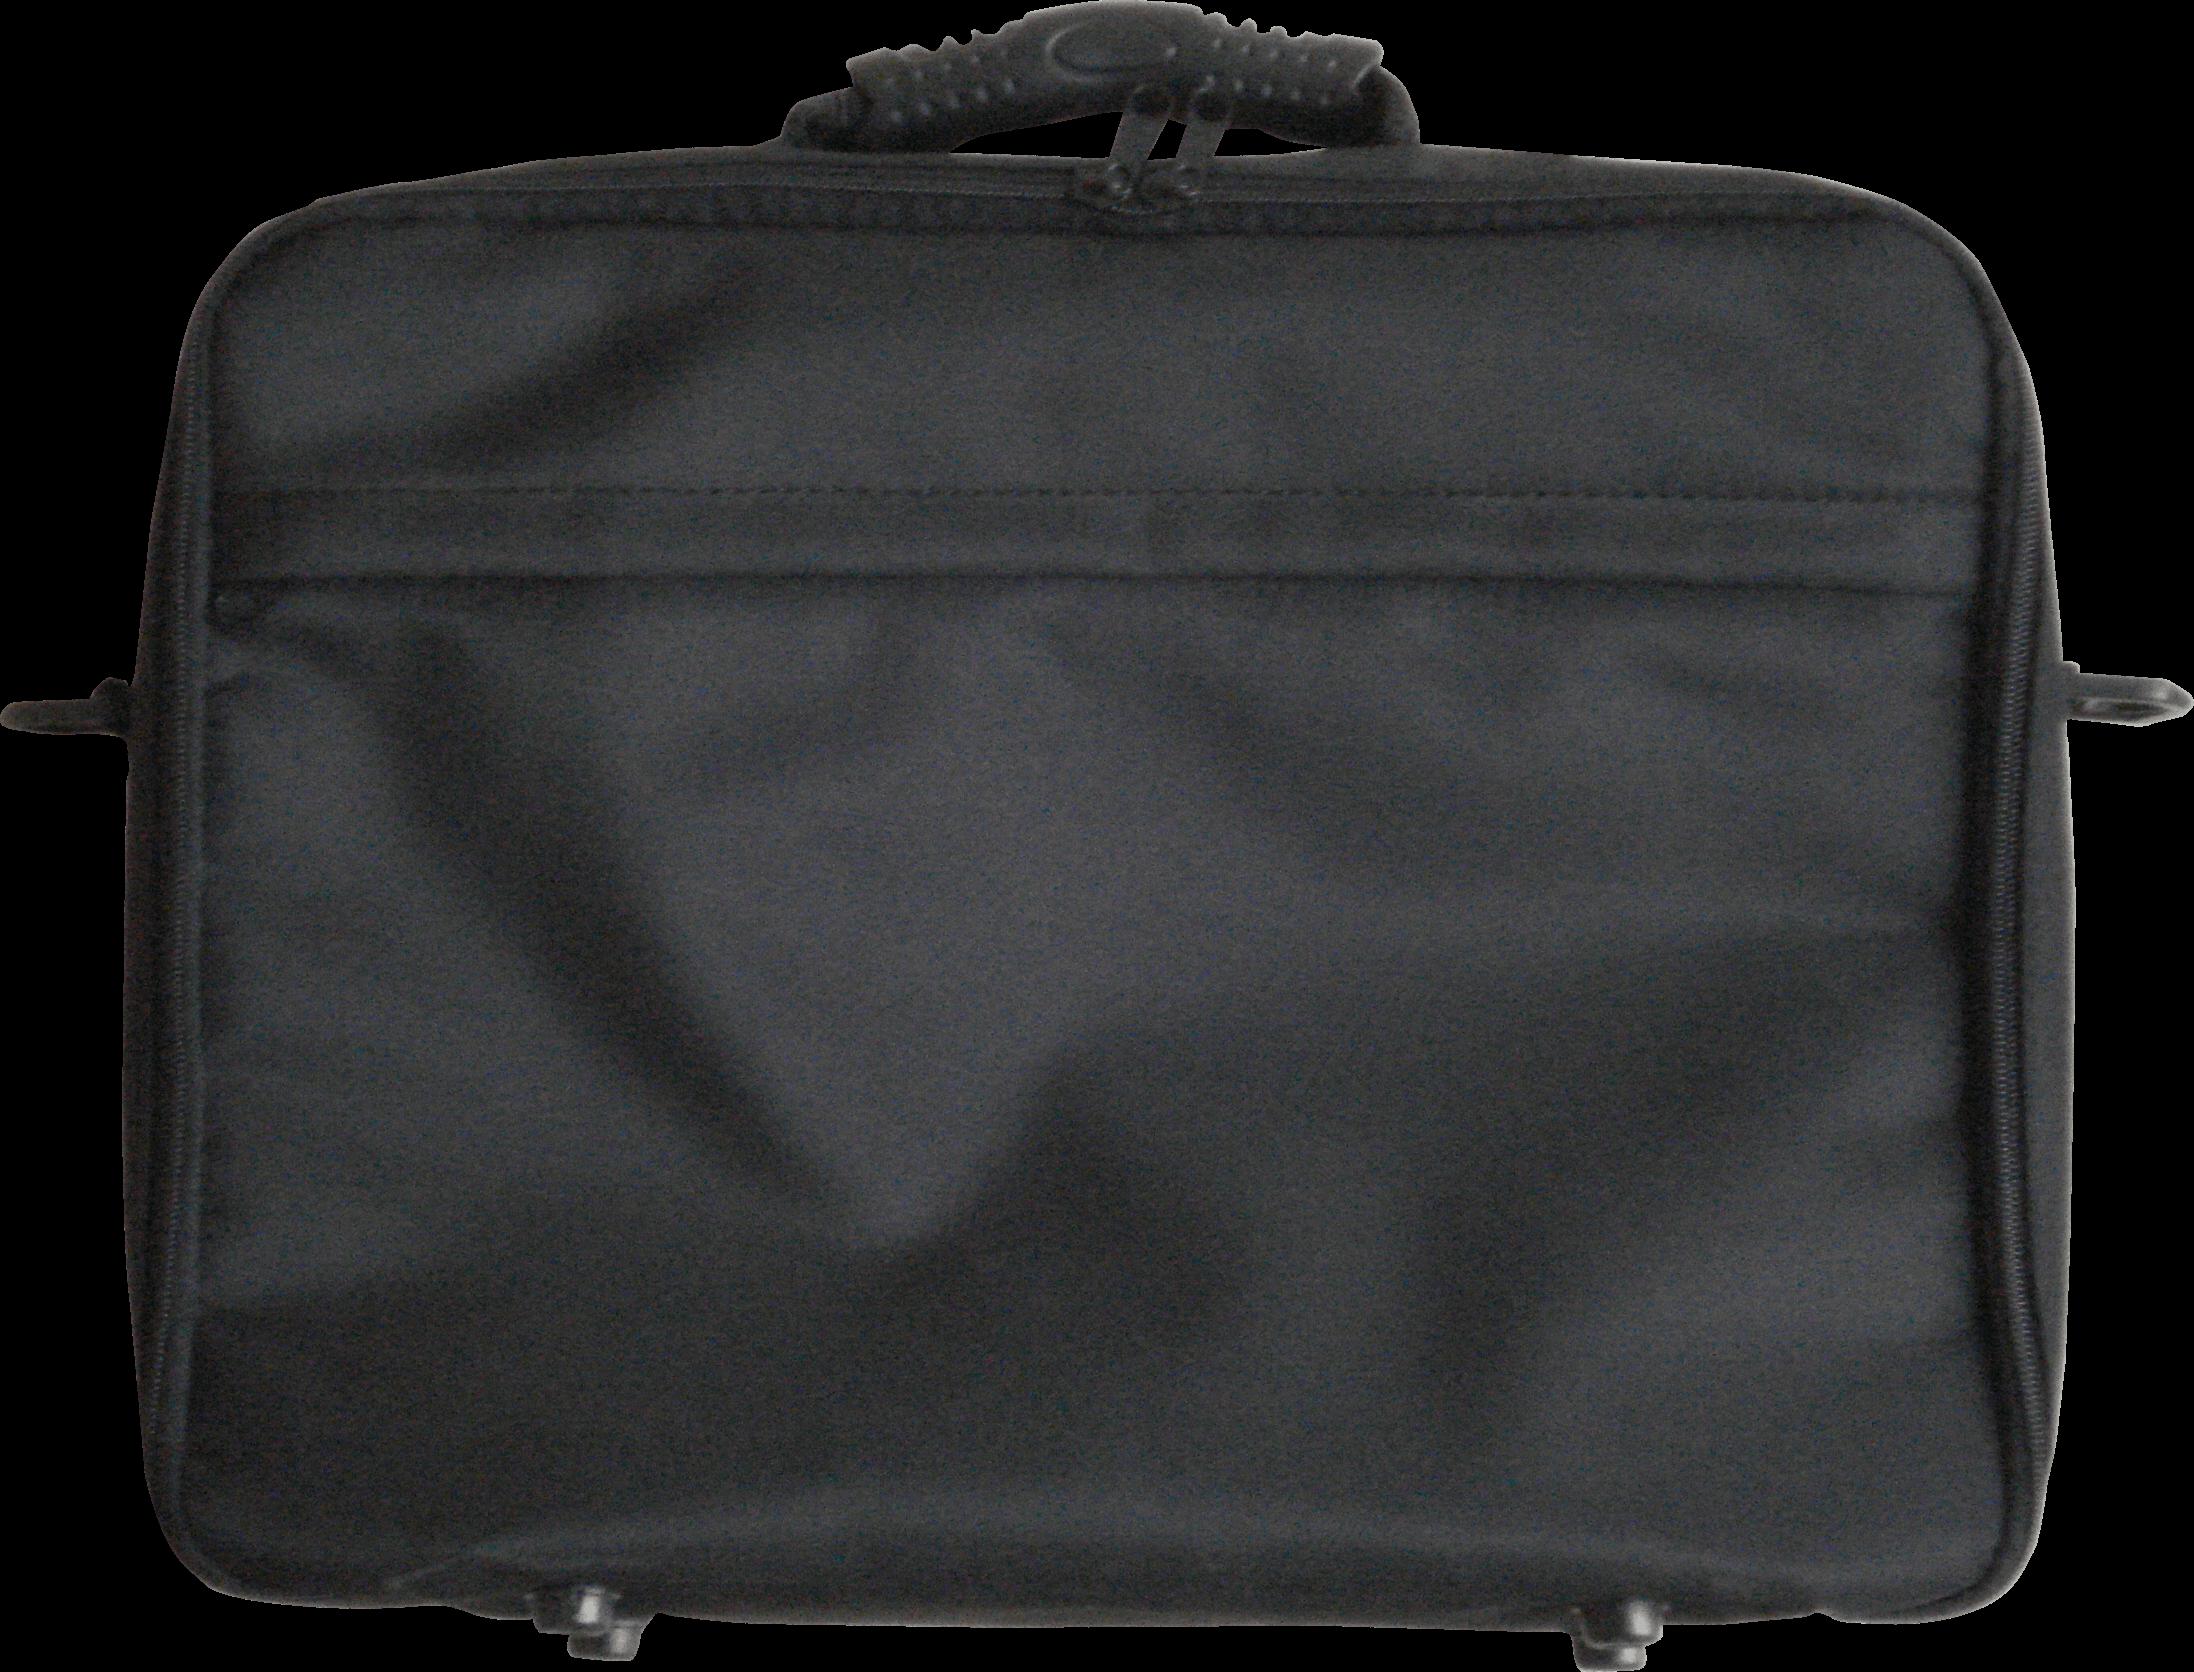 Tasche black 1 (Copy)